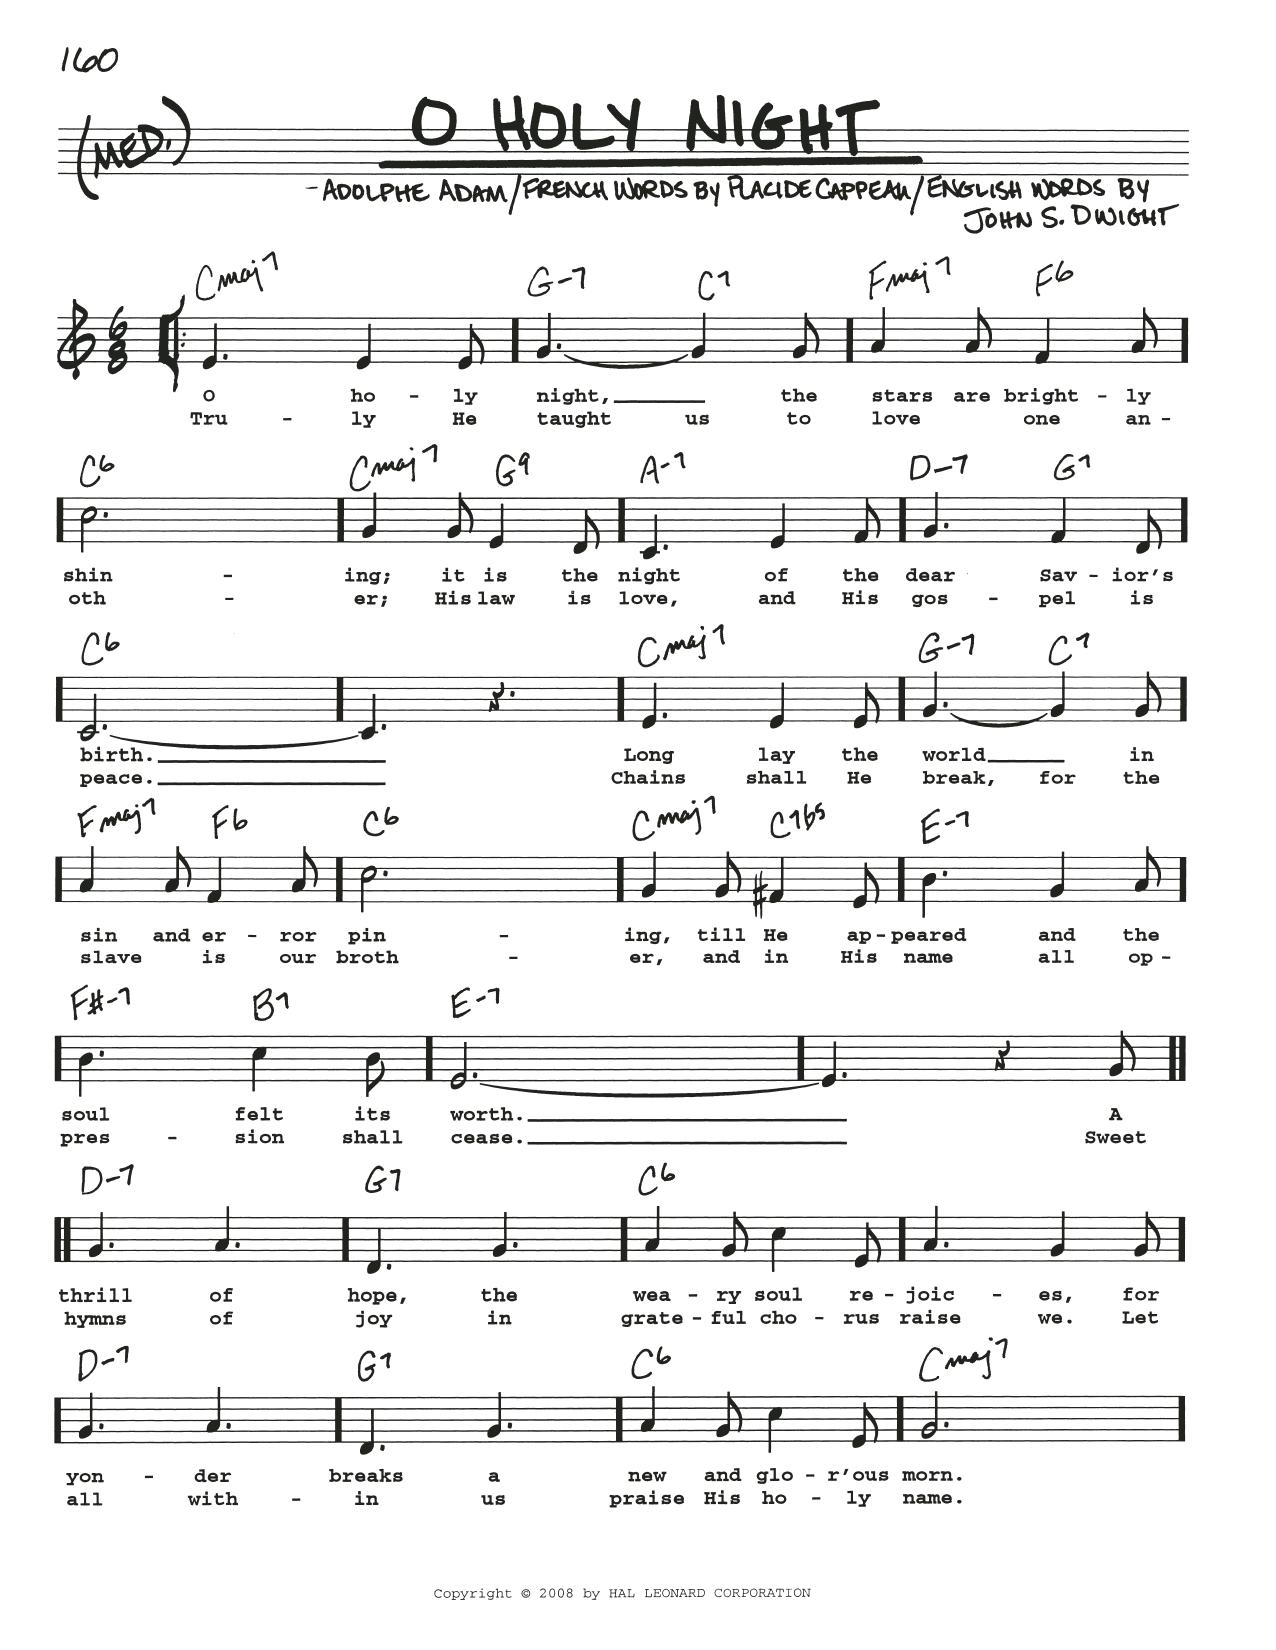 Adolphe Adam O Holy Night Sheet Music Notes Chords Printable